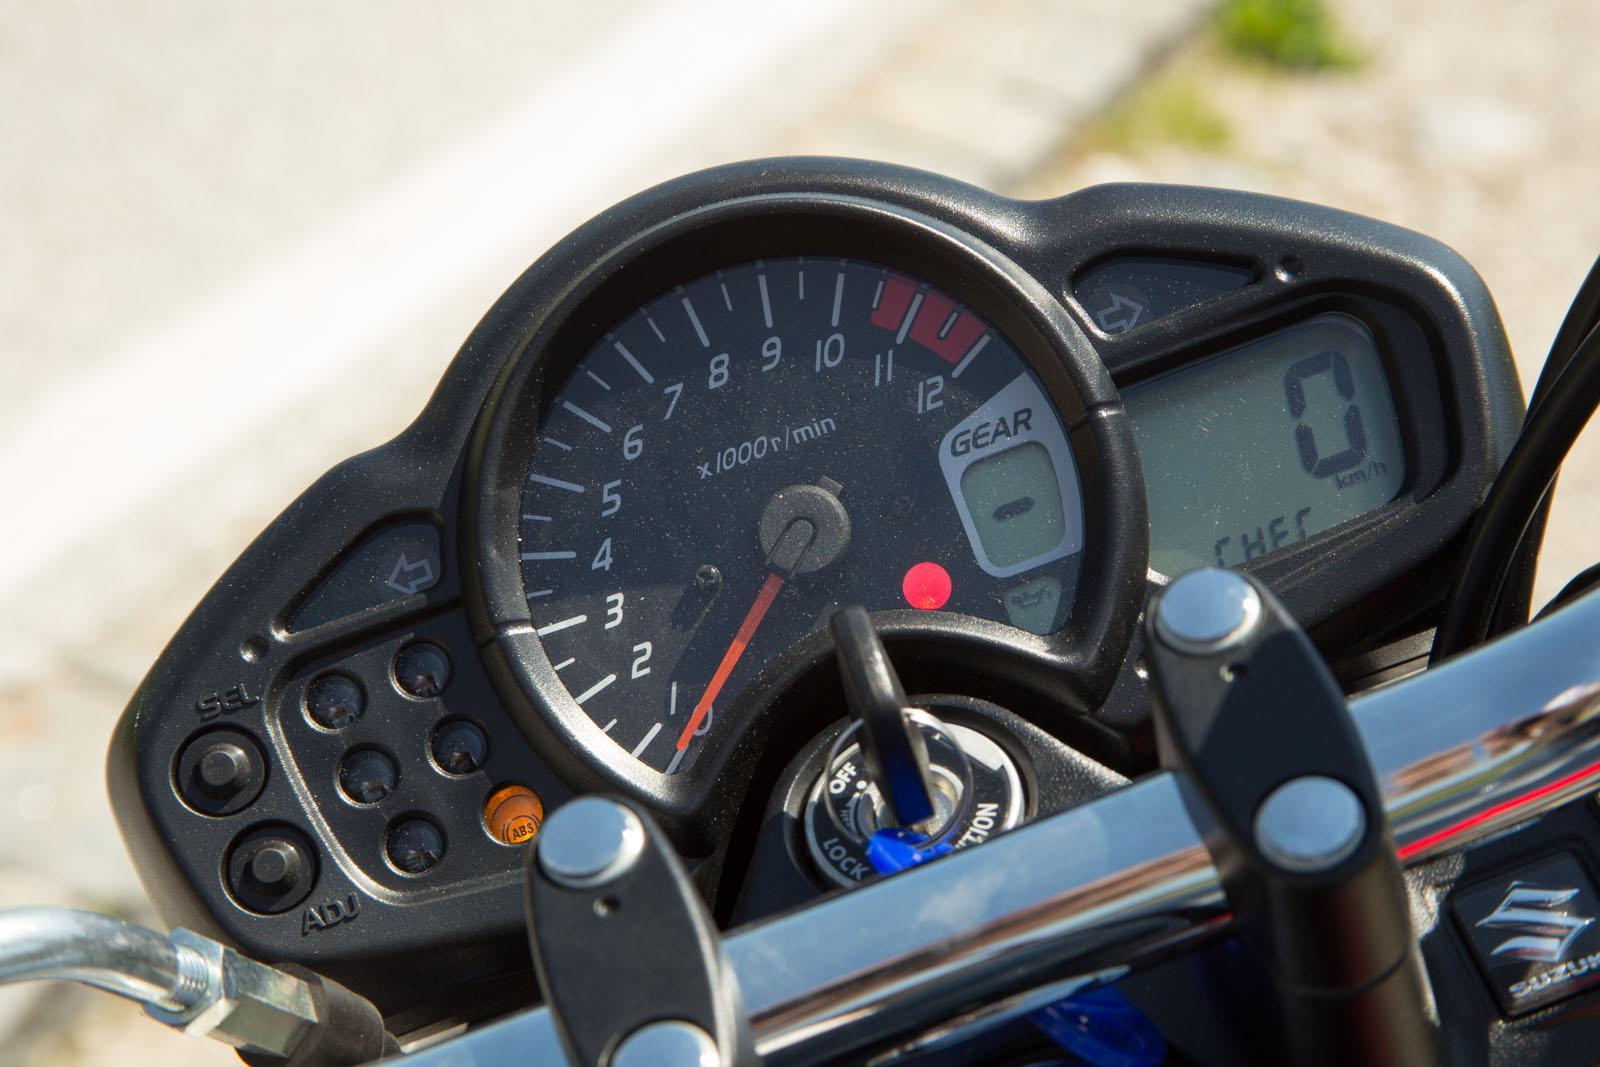 http://www.motorrad-bilder.at/slideshows/291/011178/NakedbikeTestAuswahl7.jpg